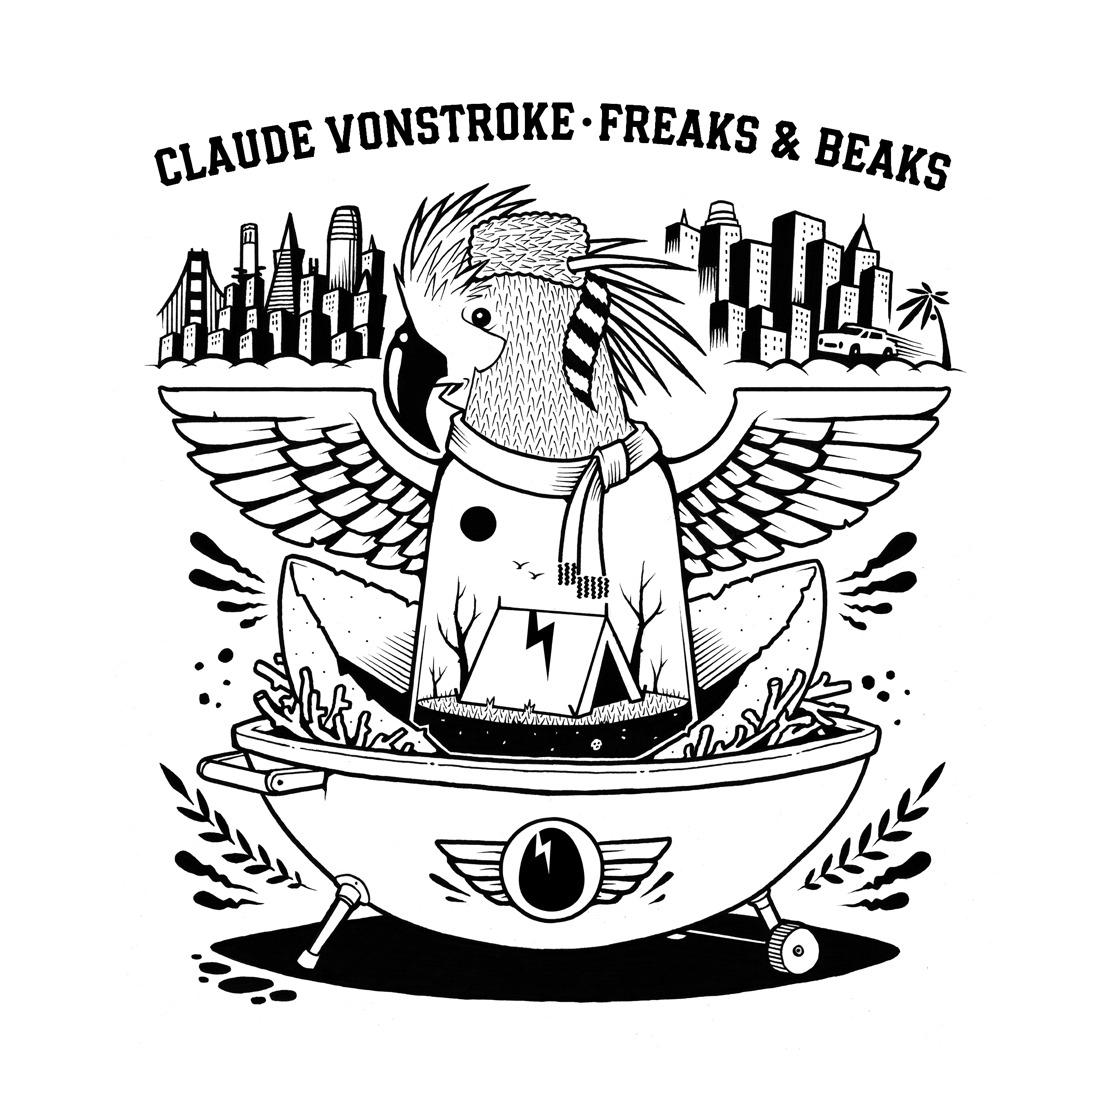 CLAUDE VONSTROKE CELEBRATES 15 YEARS OF DIRTYBIRD WITH FOURTH ALBUM 'FREAKS & BEAKS'